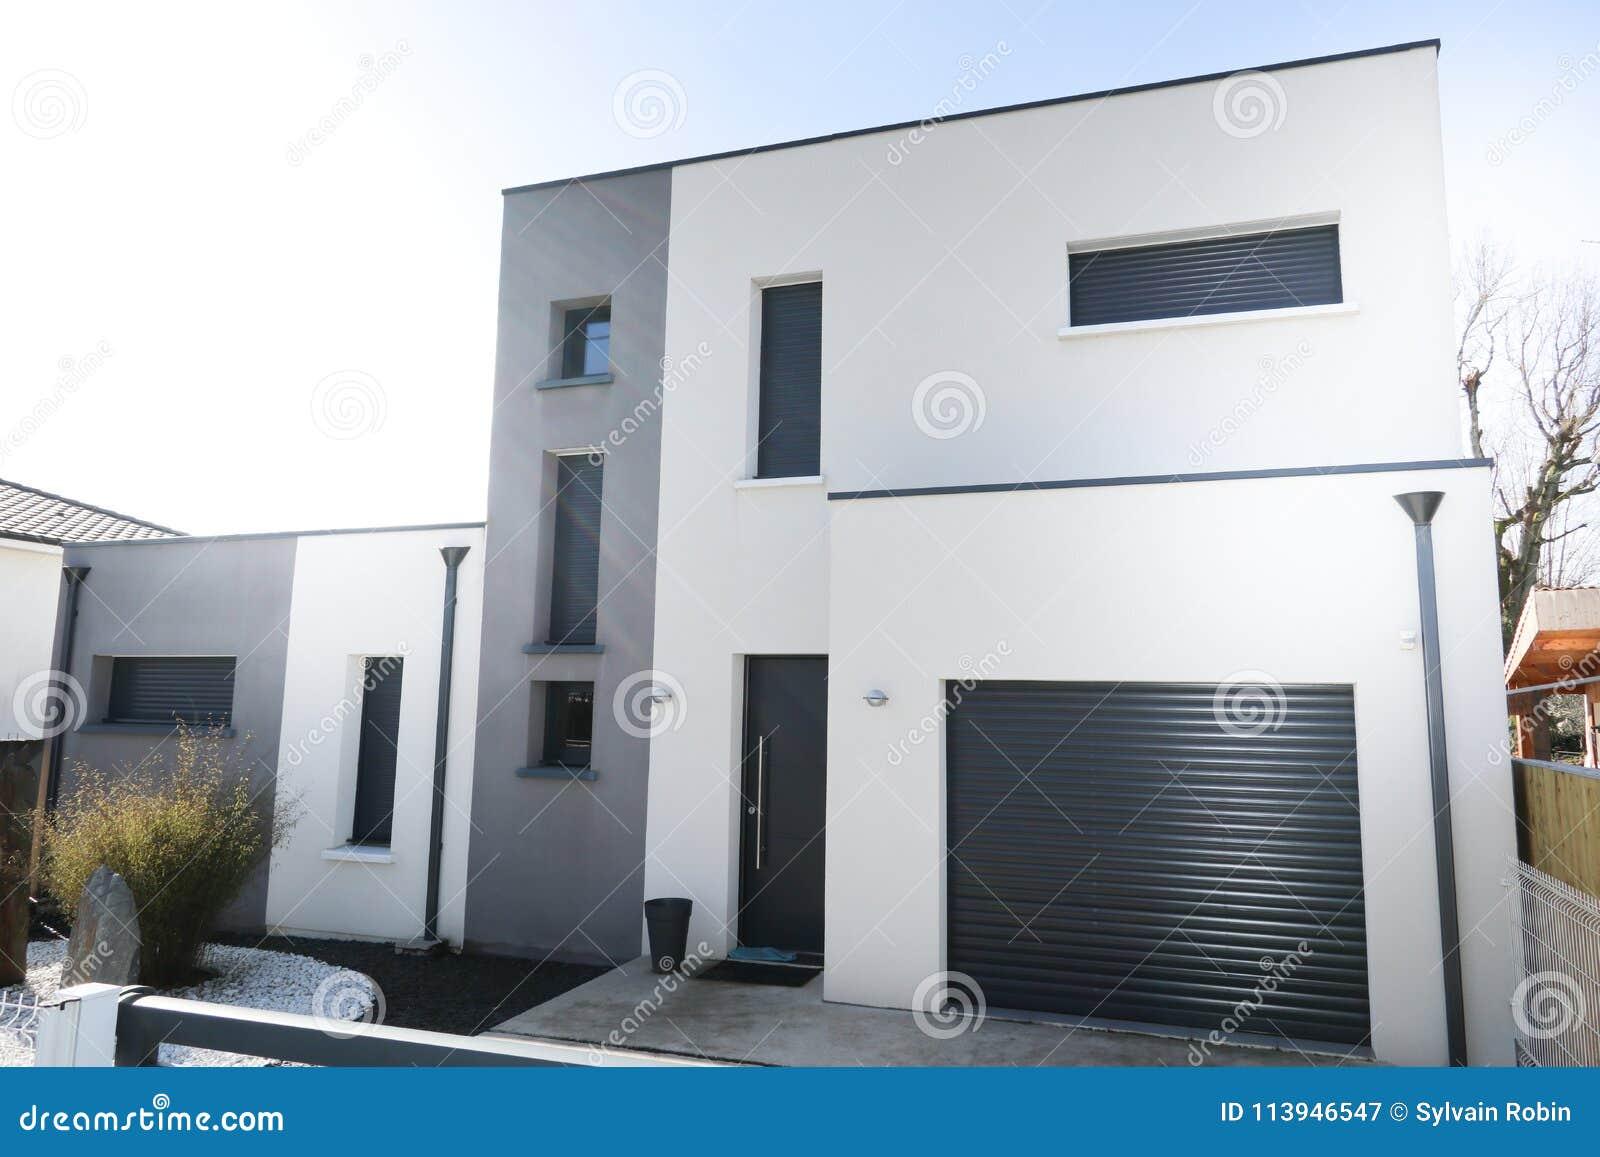 Belle Maison Blanche Et Grise Moderne Image stock - Image du ...